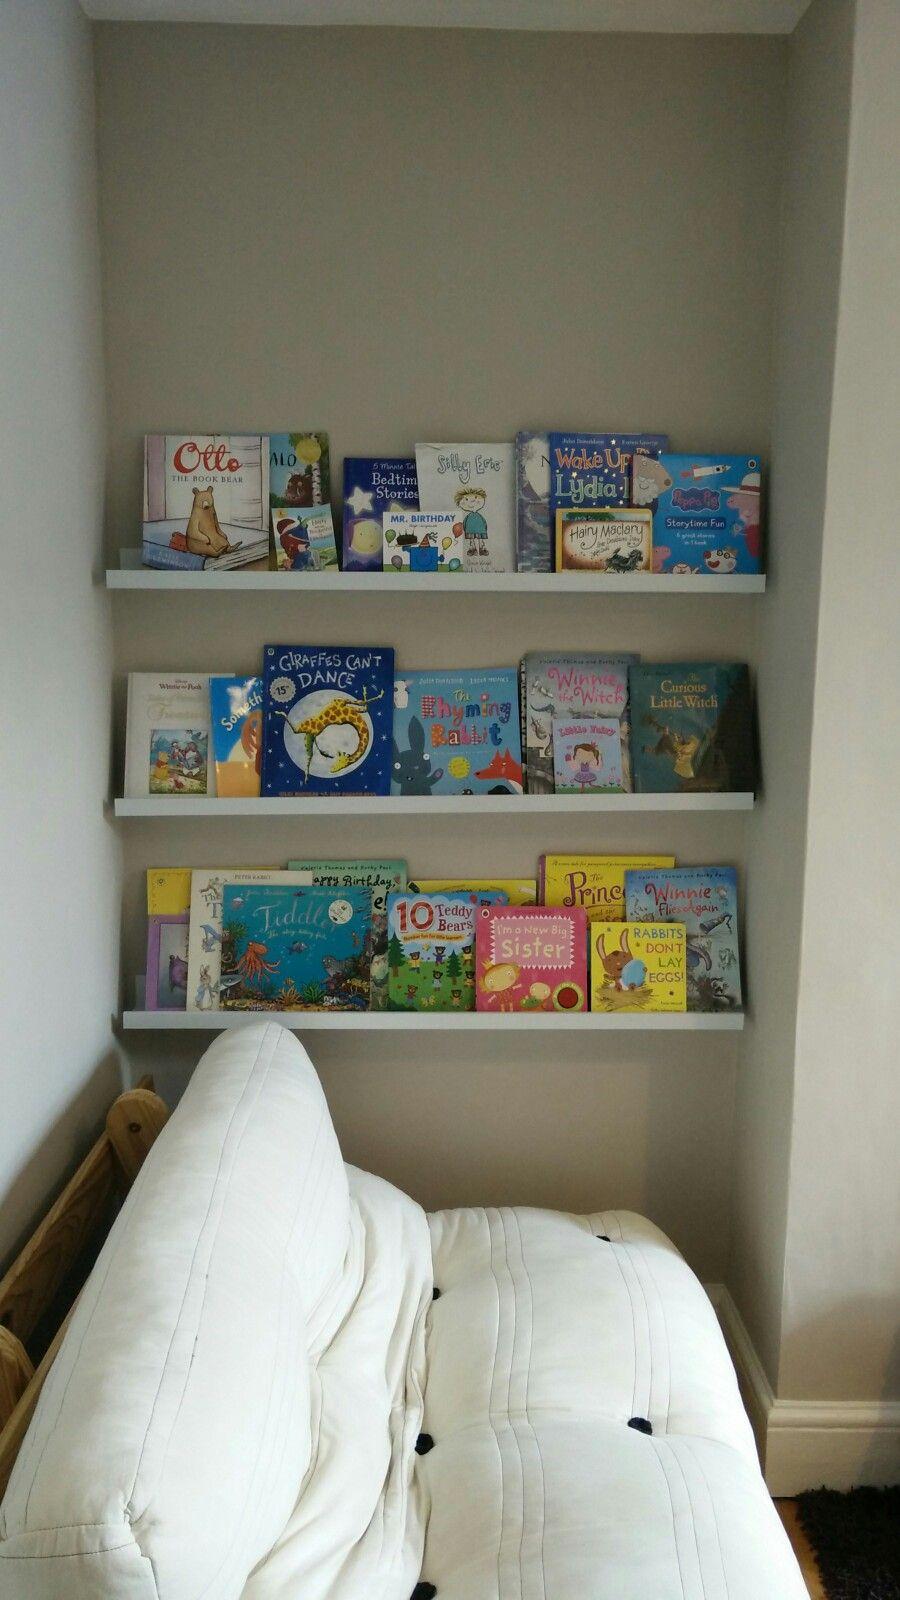 Ikea Mosslanda Picture Ledges For Books Floating Shelves Boy S